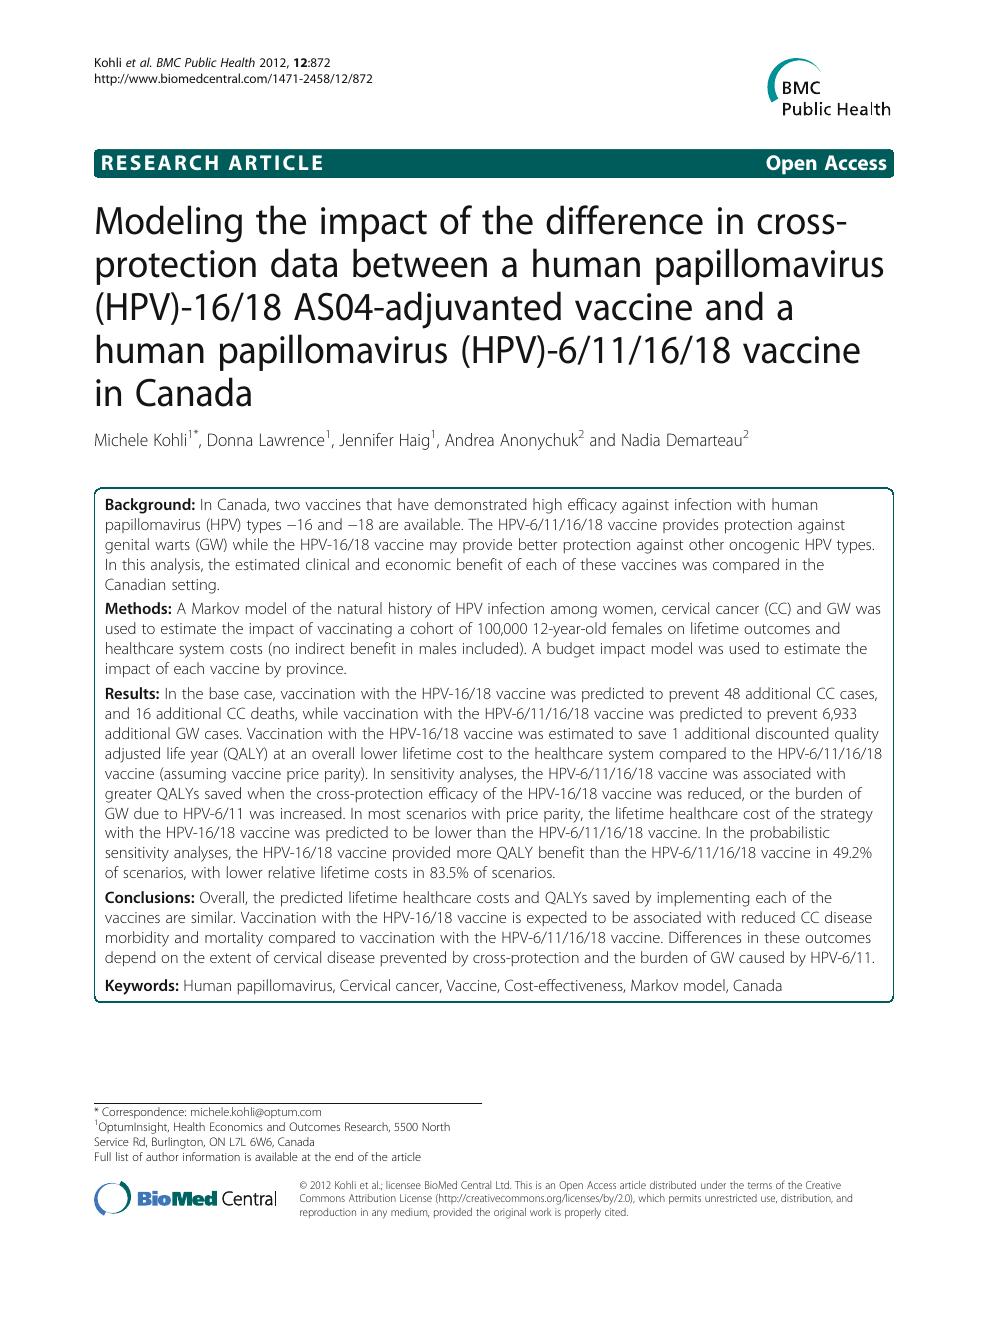 Human papillomavirus vaccine monograph, Paraziți coreeni